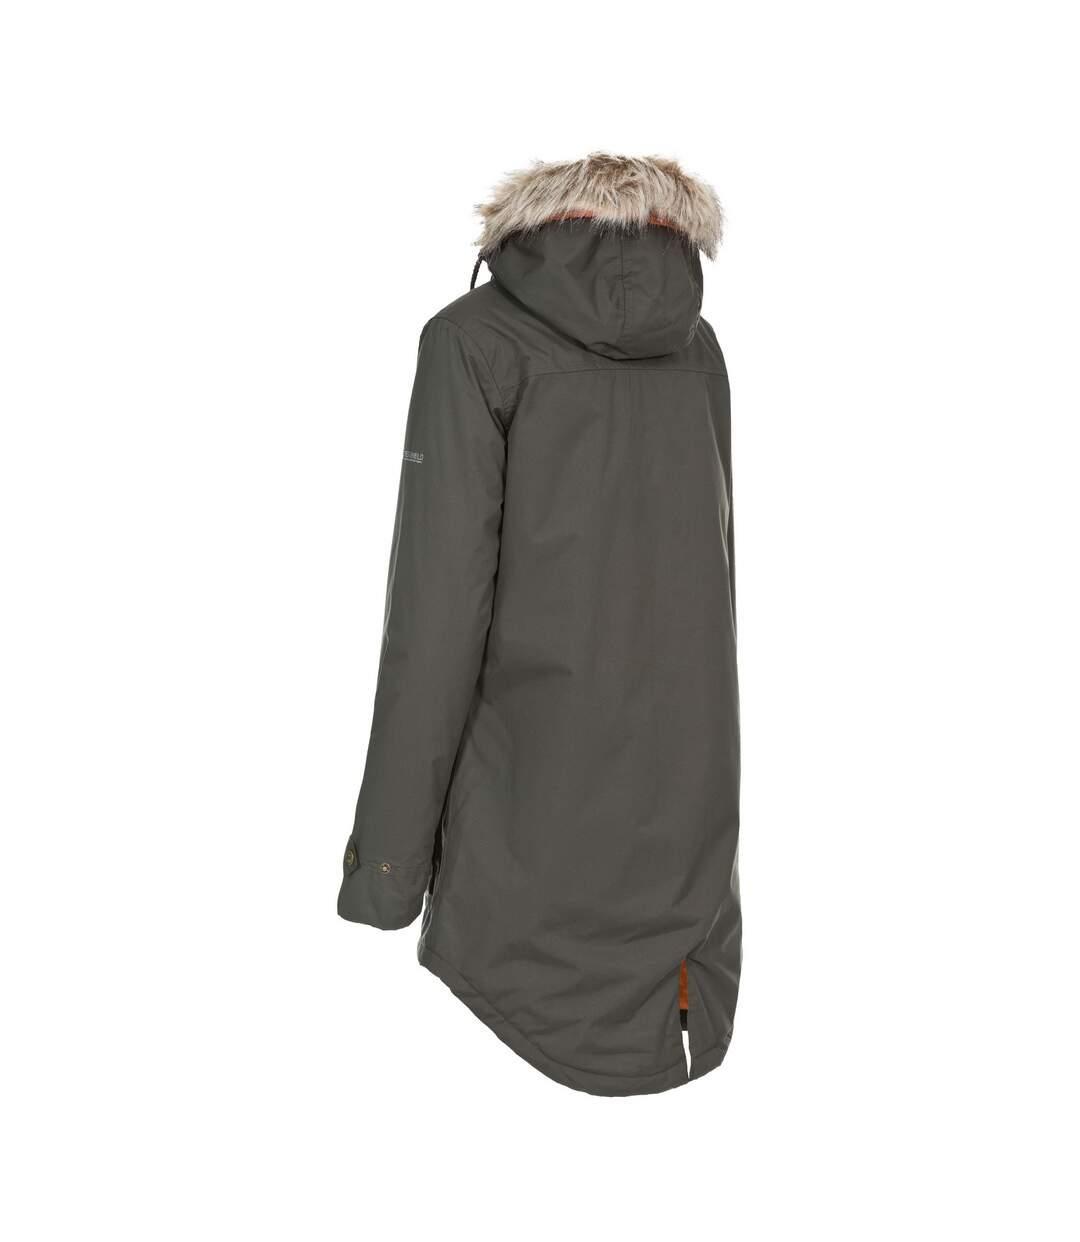 Trespass Womens/Ladies Clea Waterproof Parka Padded Jacket (Dark Khaki) - UTTP4500